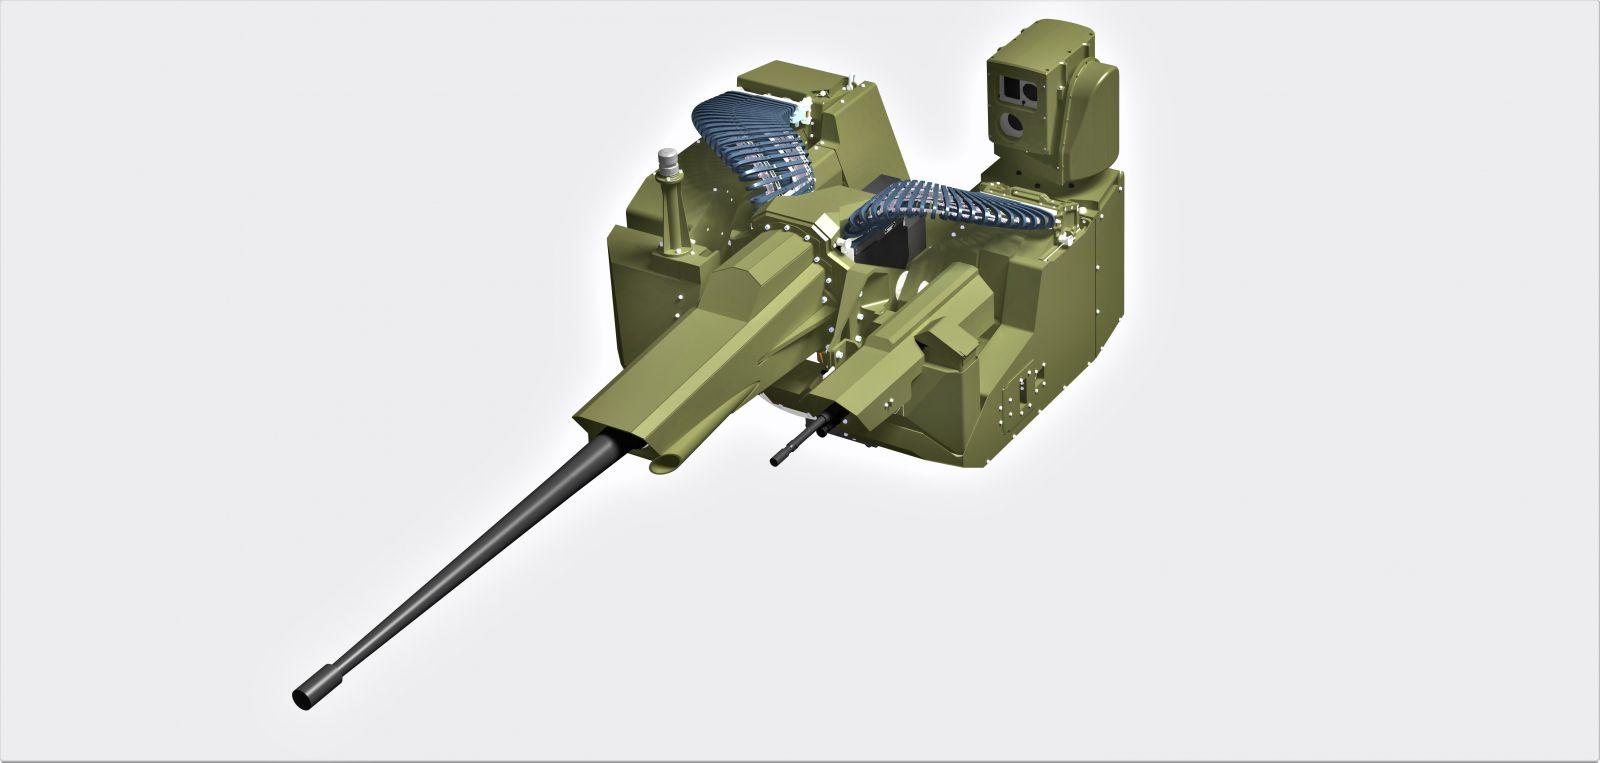 John Cockerill Defense разработва нова лека бойна станция CLWS с 25 mm оръдие (ЕКСКЛУЗИВНА ГАЛЕРИЯ)